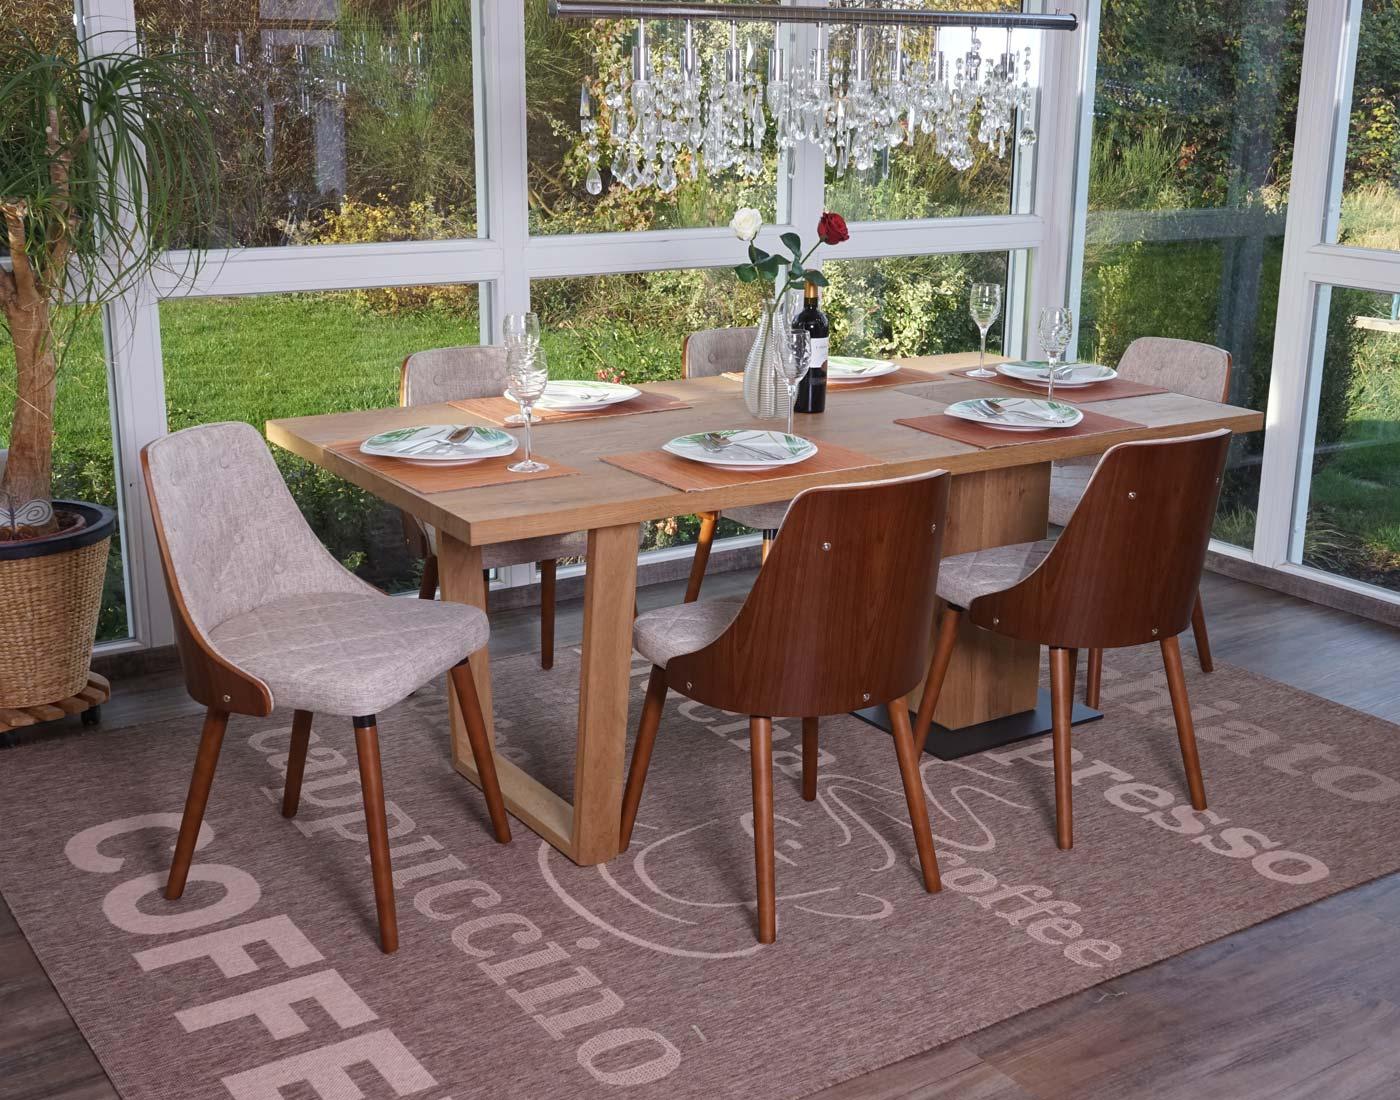 Set 6x sedie sala da pranzo soggiorno hwc a75 53x50x82cm for Sedie sala pranzo